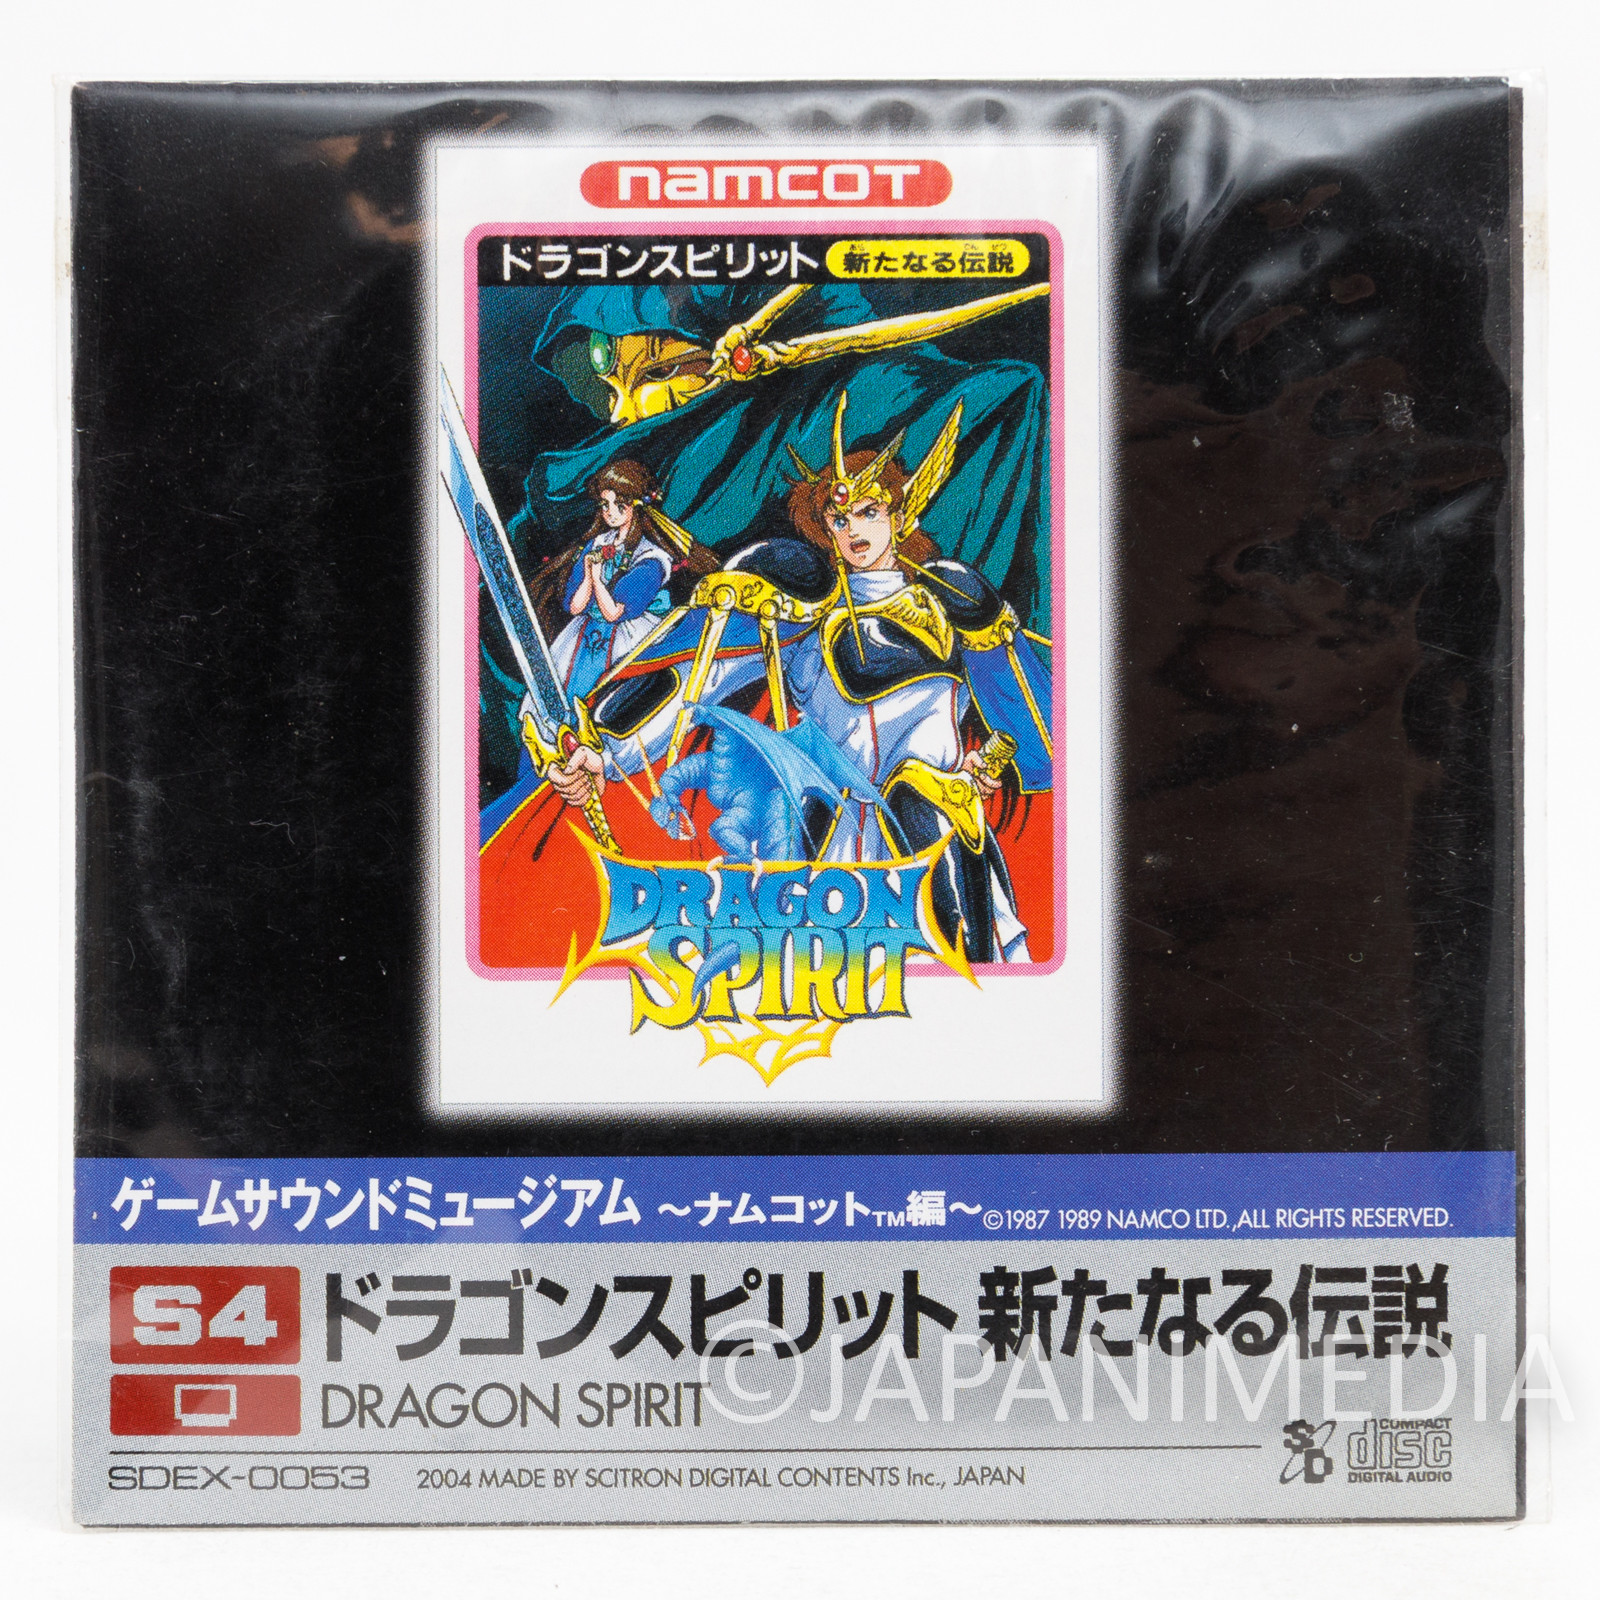 Dragon Spirit Game Sound Museum Namco #04 Music 8cm CD JAPAN FAMICOM NINTNEDO